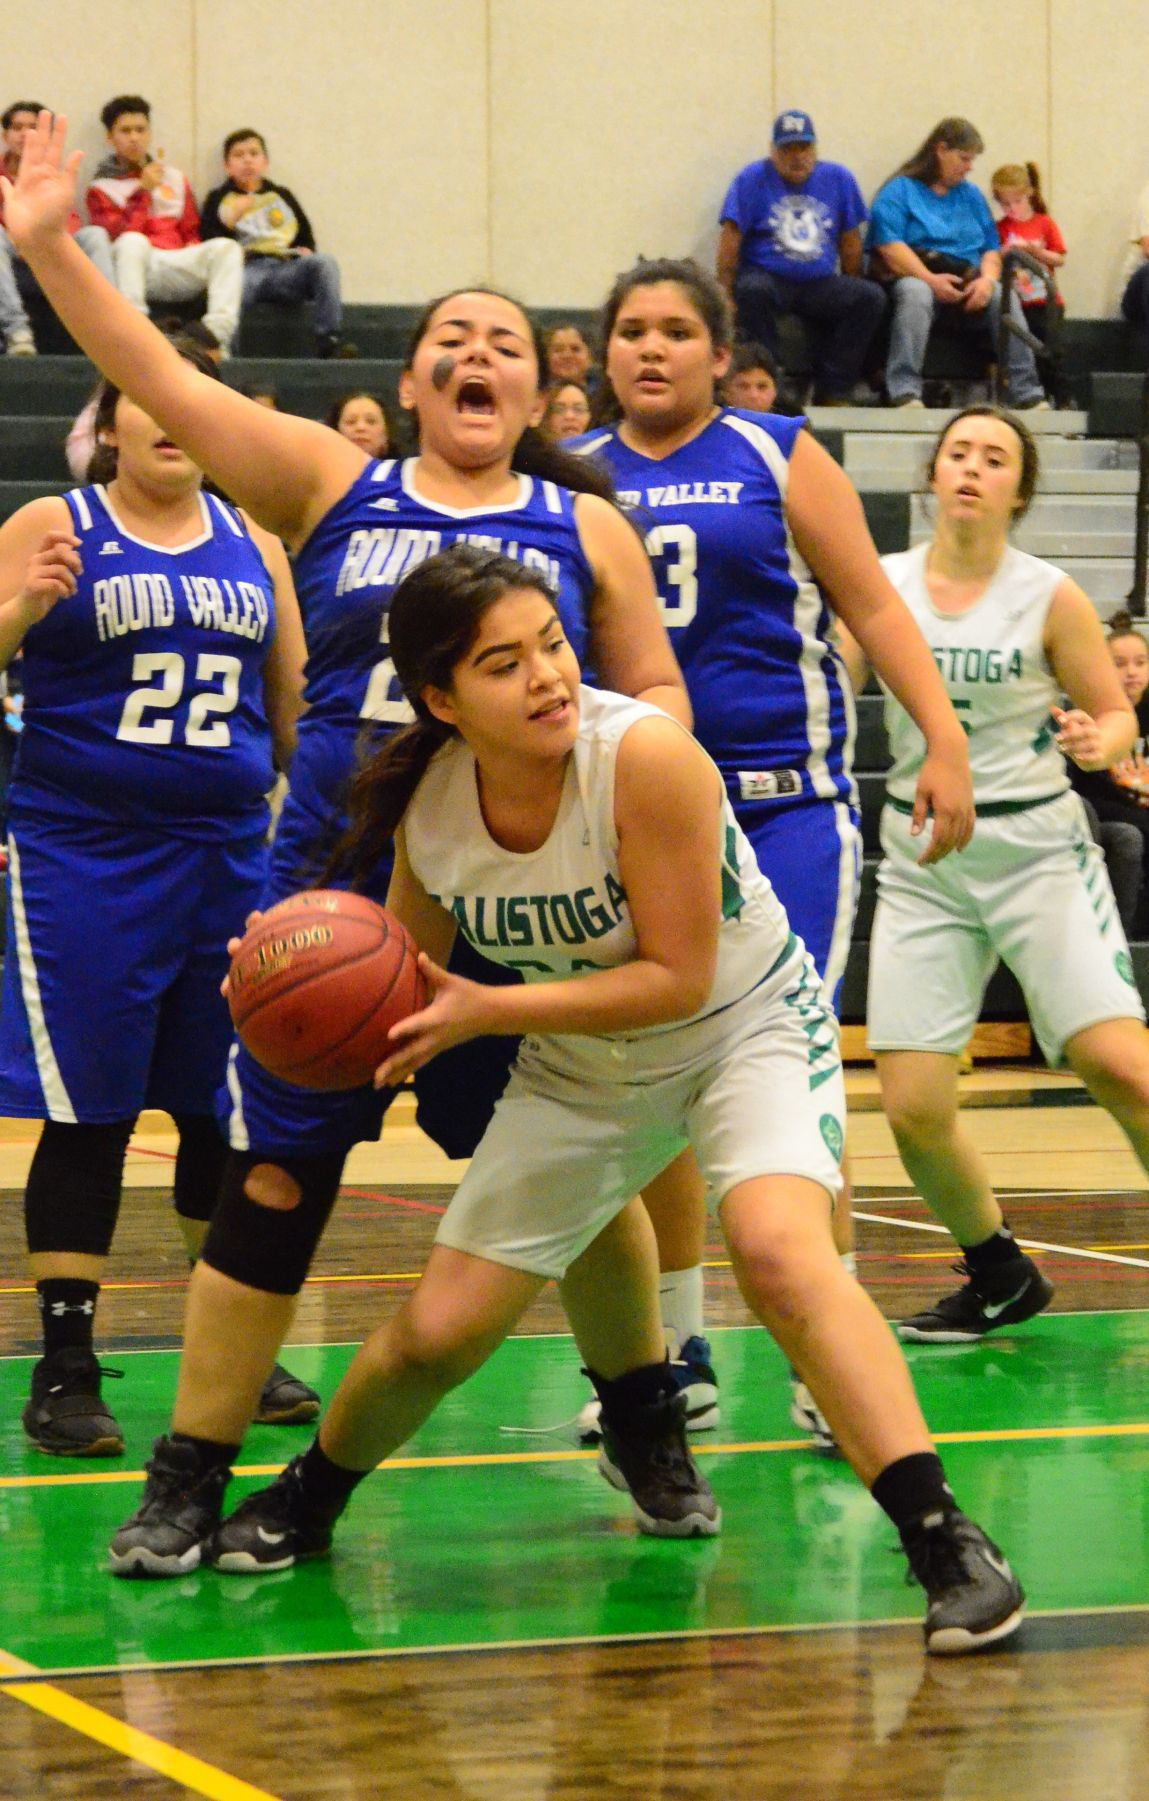 Calistoga High Girls Basketball